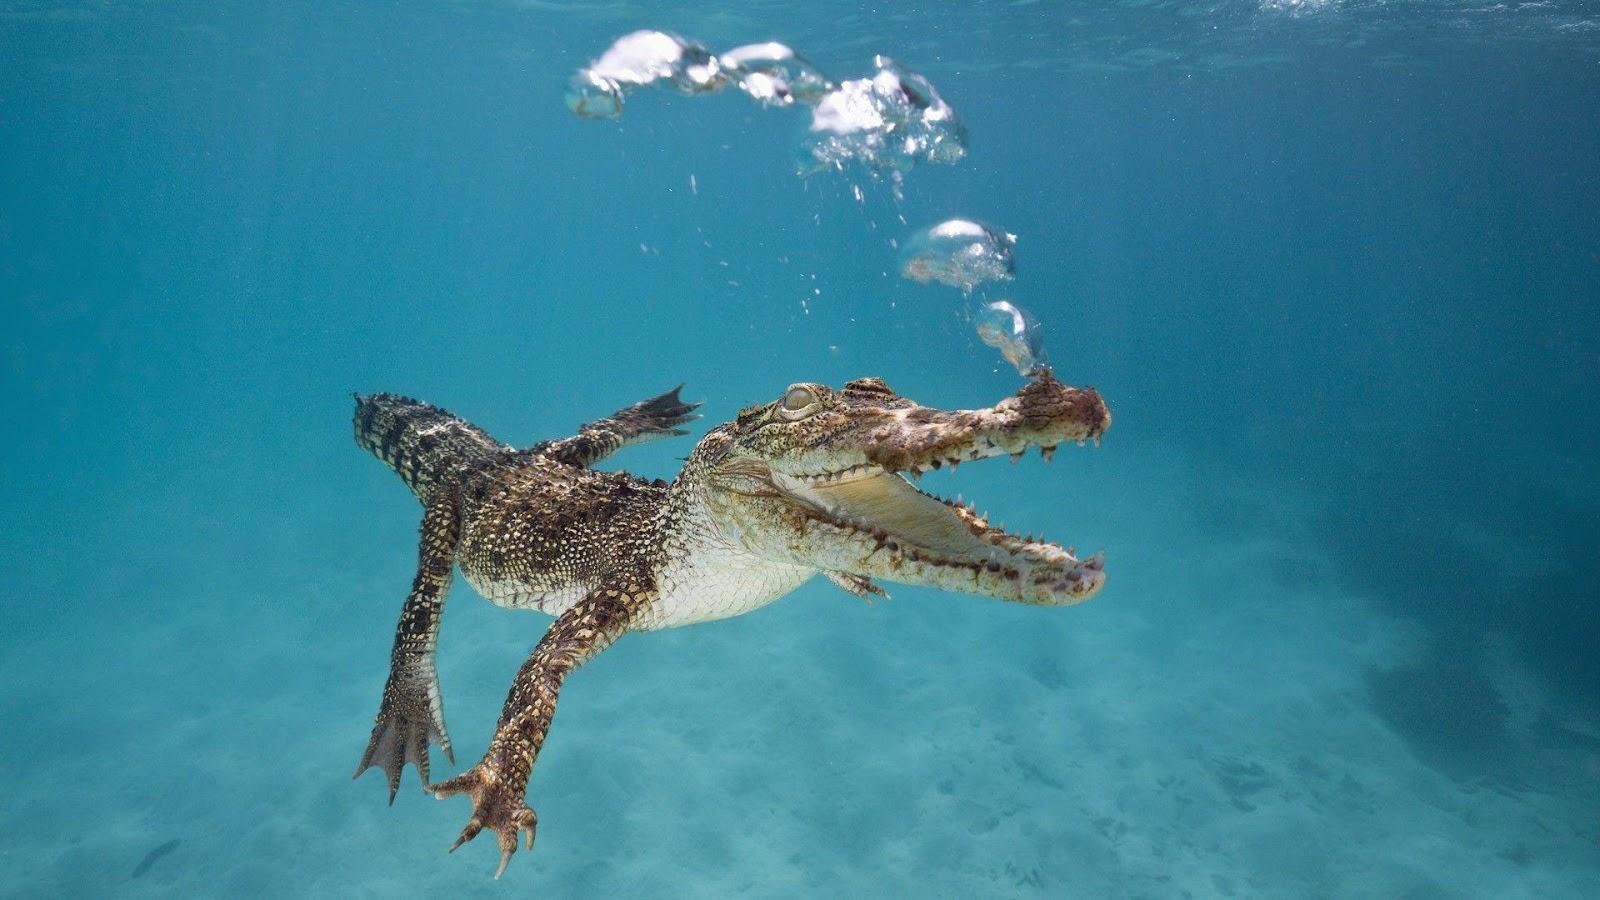 Swimming alligator Wallpapers, animal wallpapers